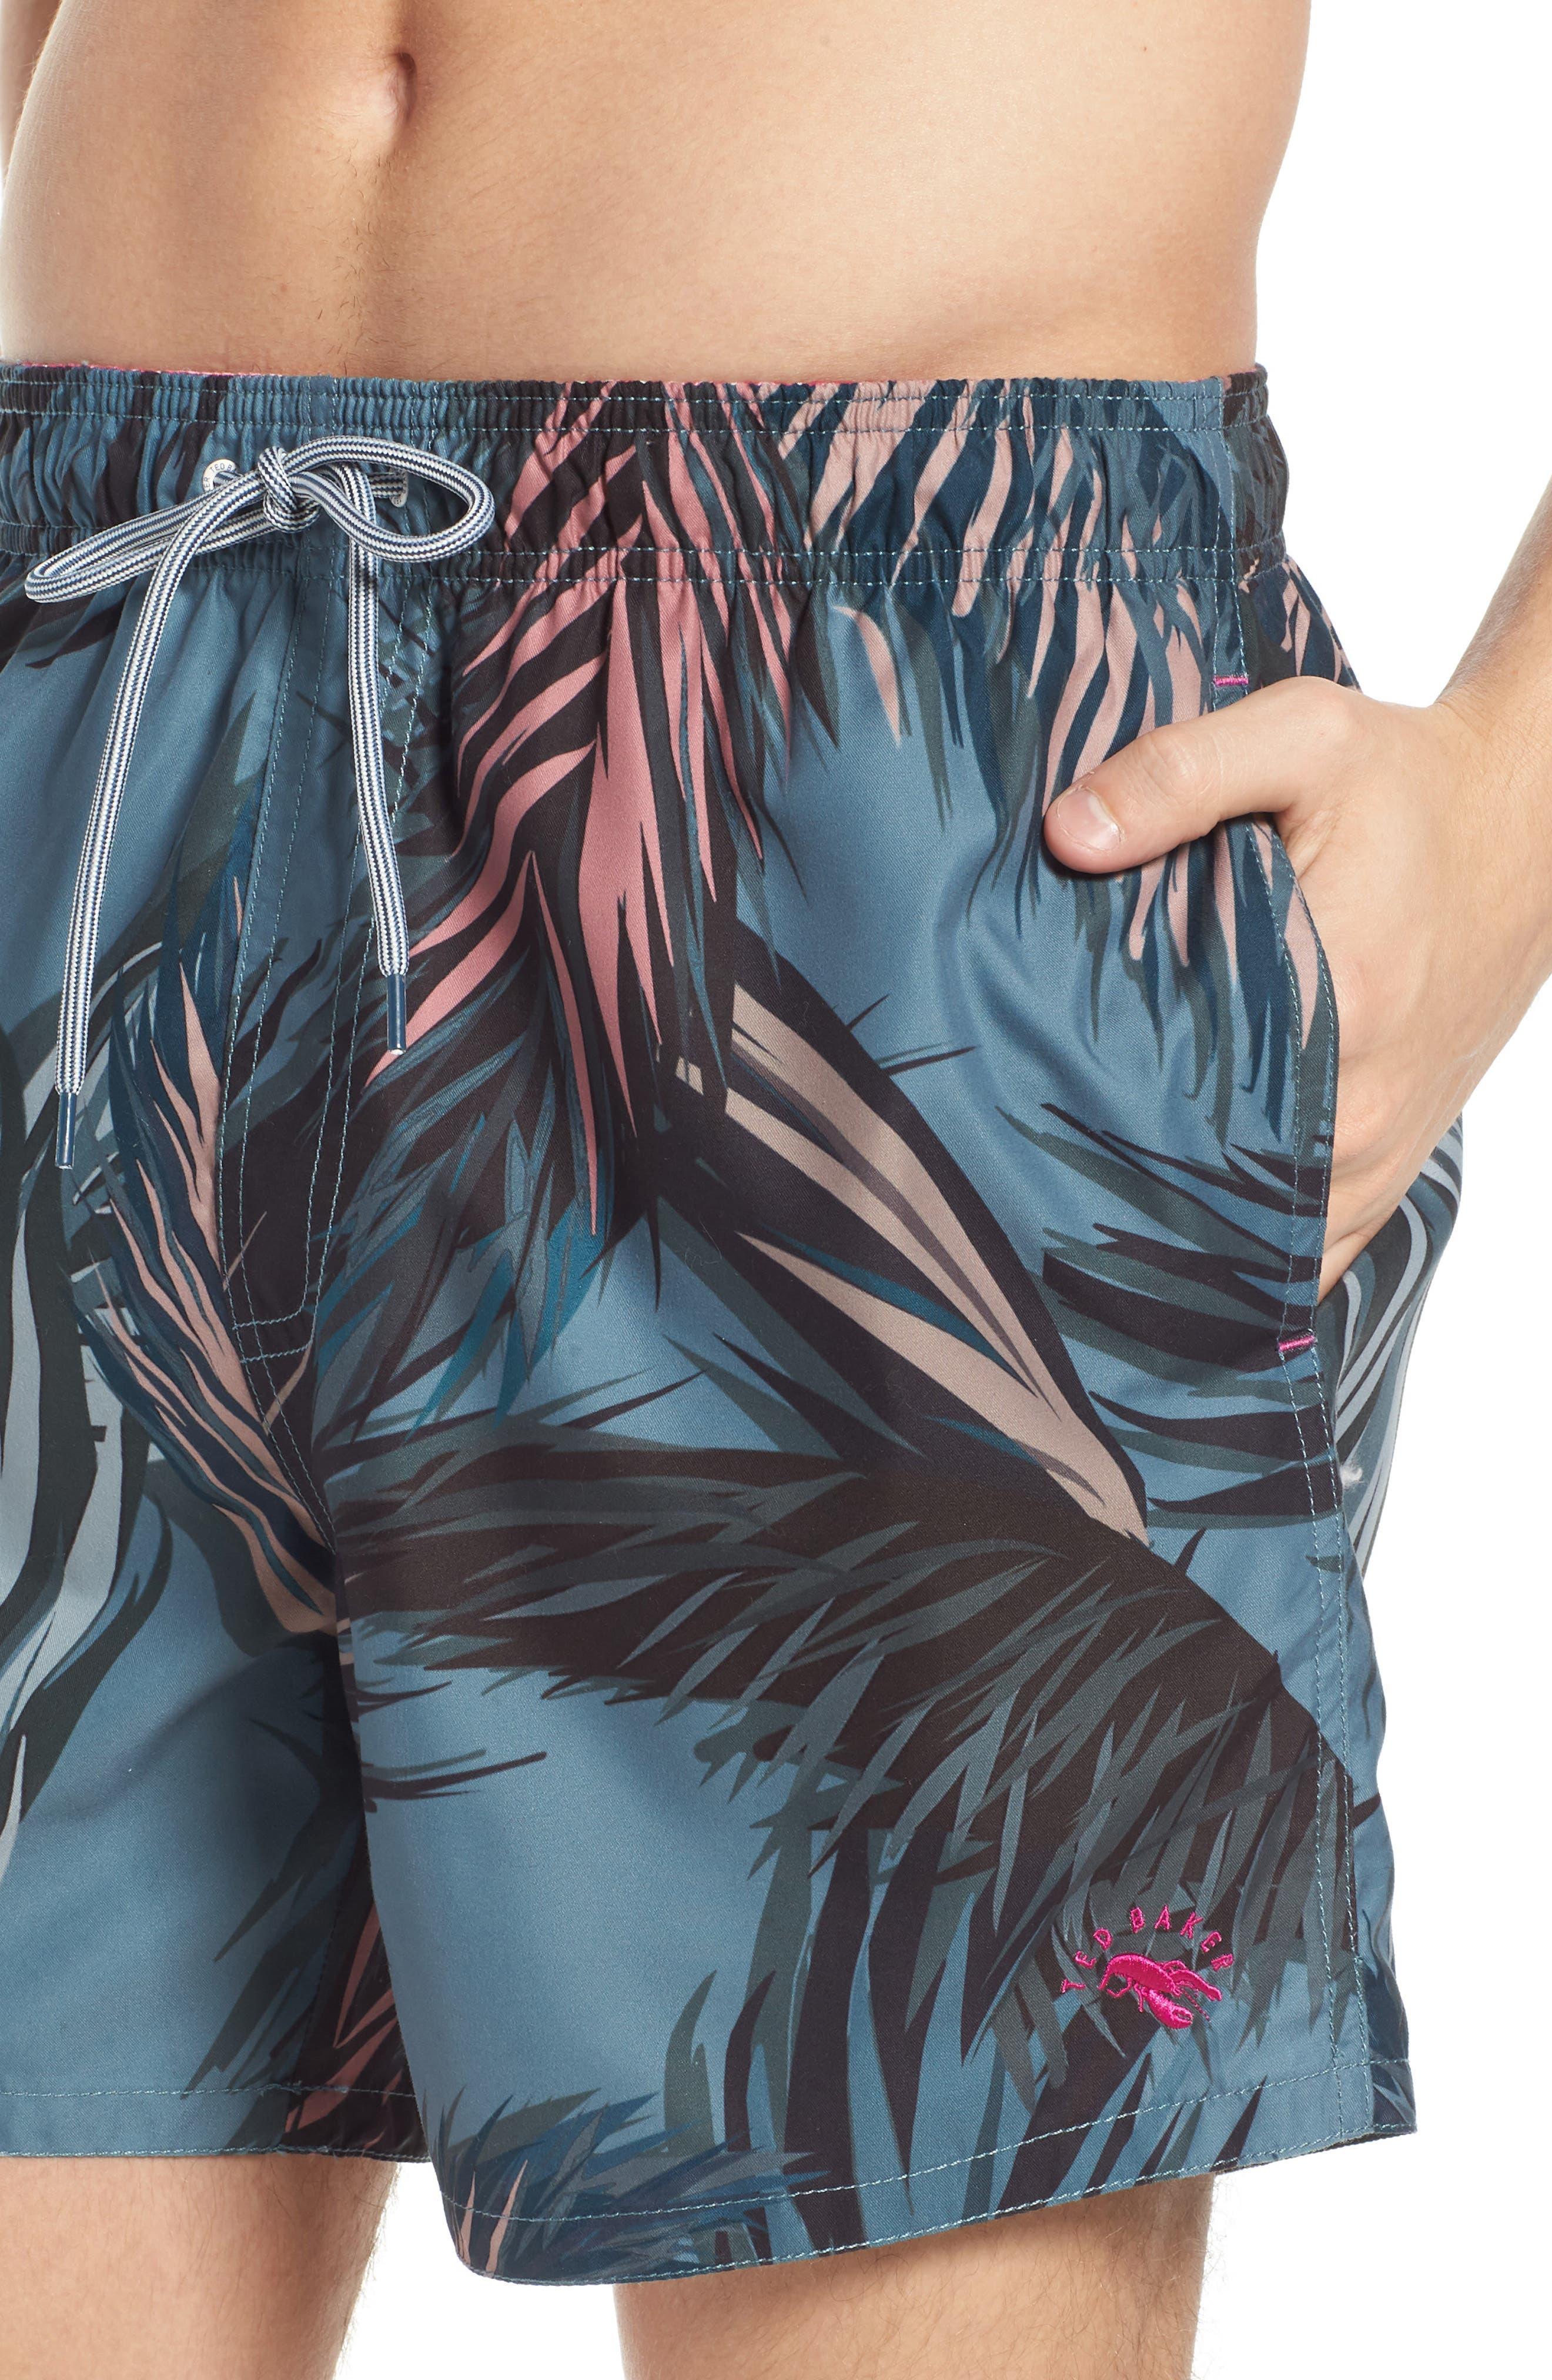 Raynebo Slim Fit Palm Leaf Swim Trunks,                             Alternate thumbnail 4, color,                             Dark Green